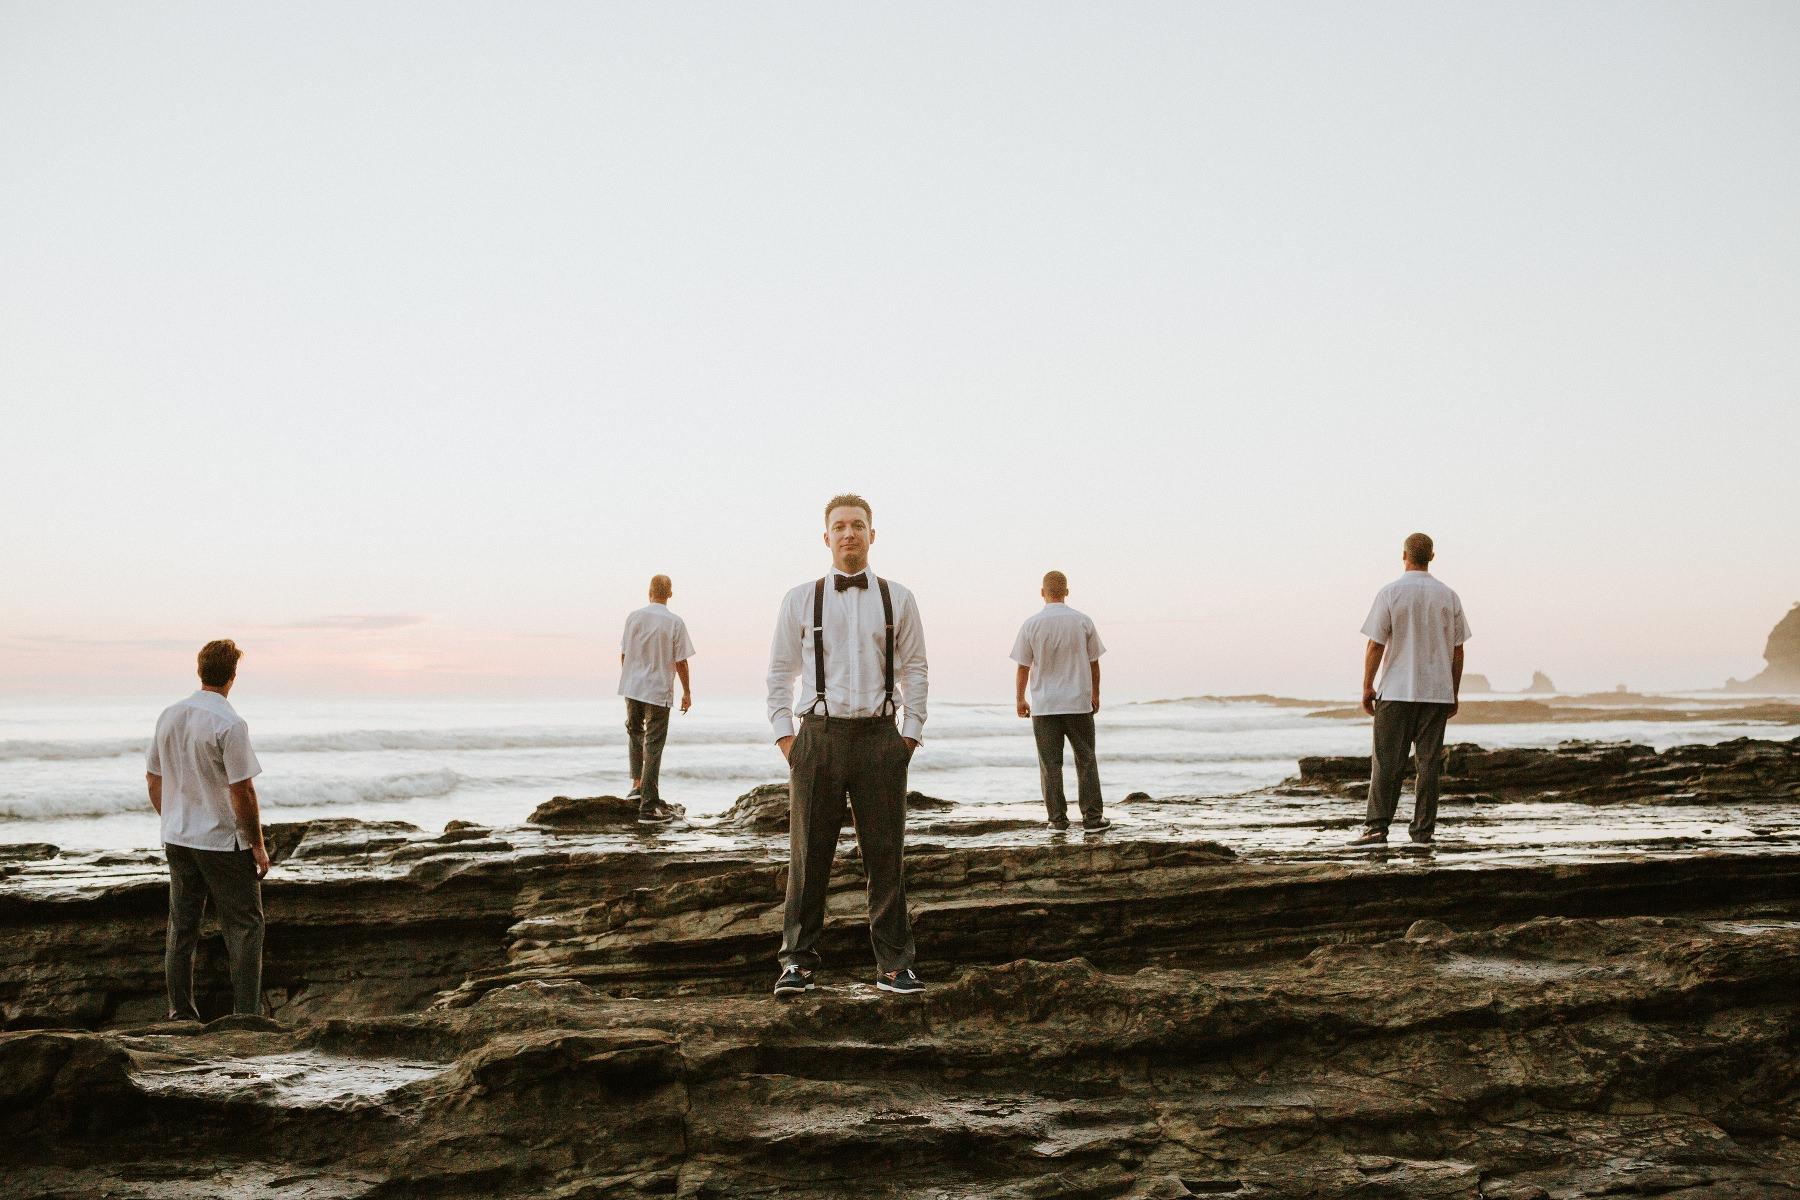 Groomsmen photo ideas for beach wedding Costa Rica